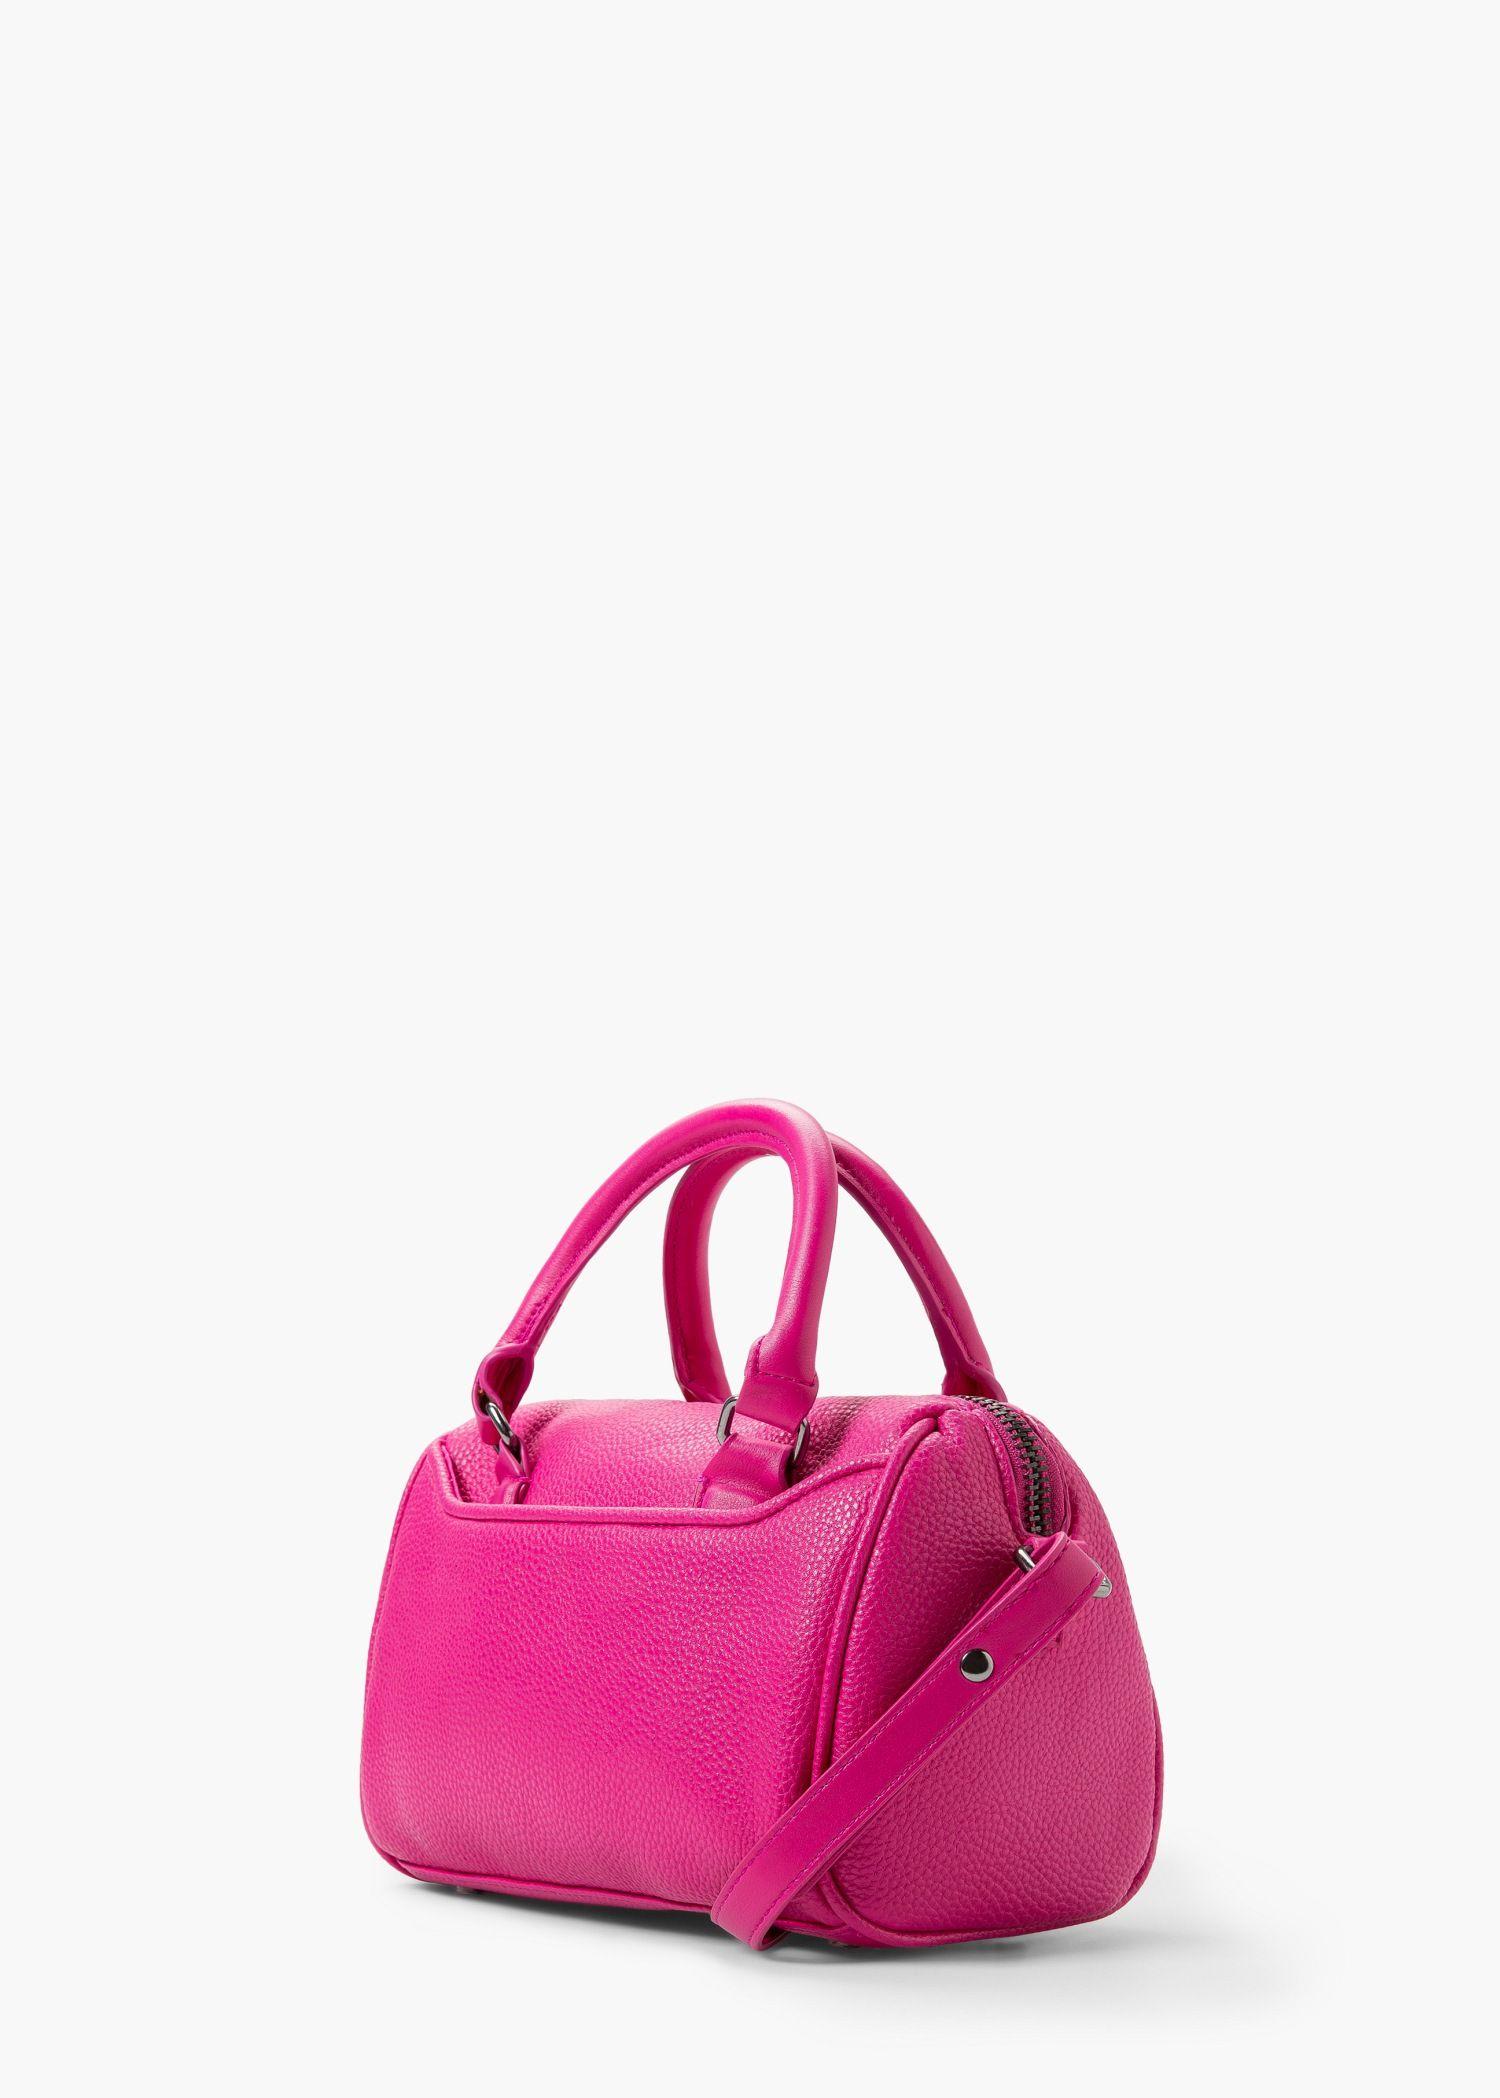 184ecd1be0cc9 Pürtüklü çapraz çanta - Kadın | MANGO | Shoes and bags | Bags, Gym ...